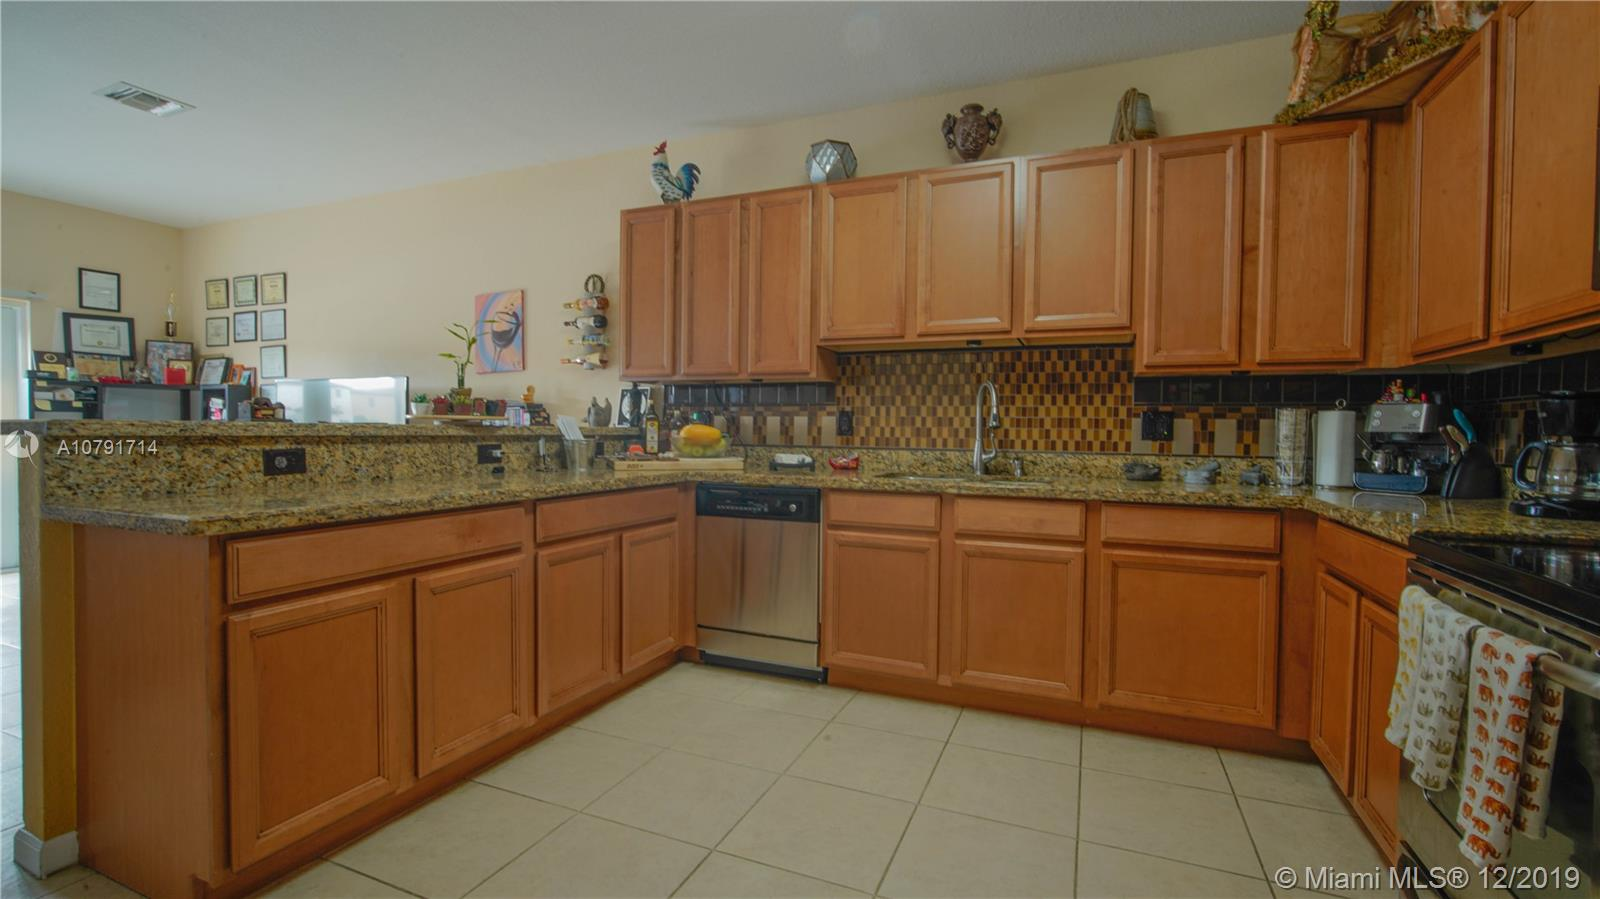 527 SE 31st Ave, Homestead, FL 33033 - Homestead, FL real estate listing